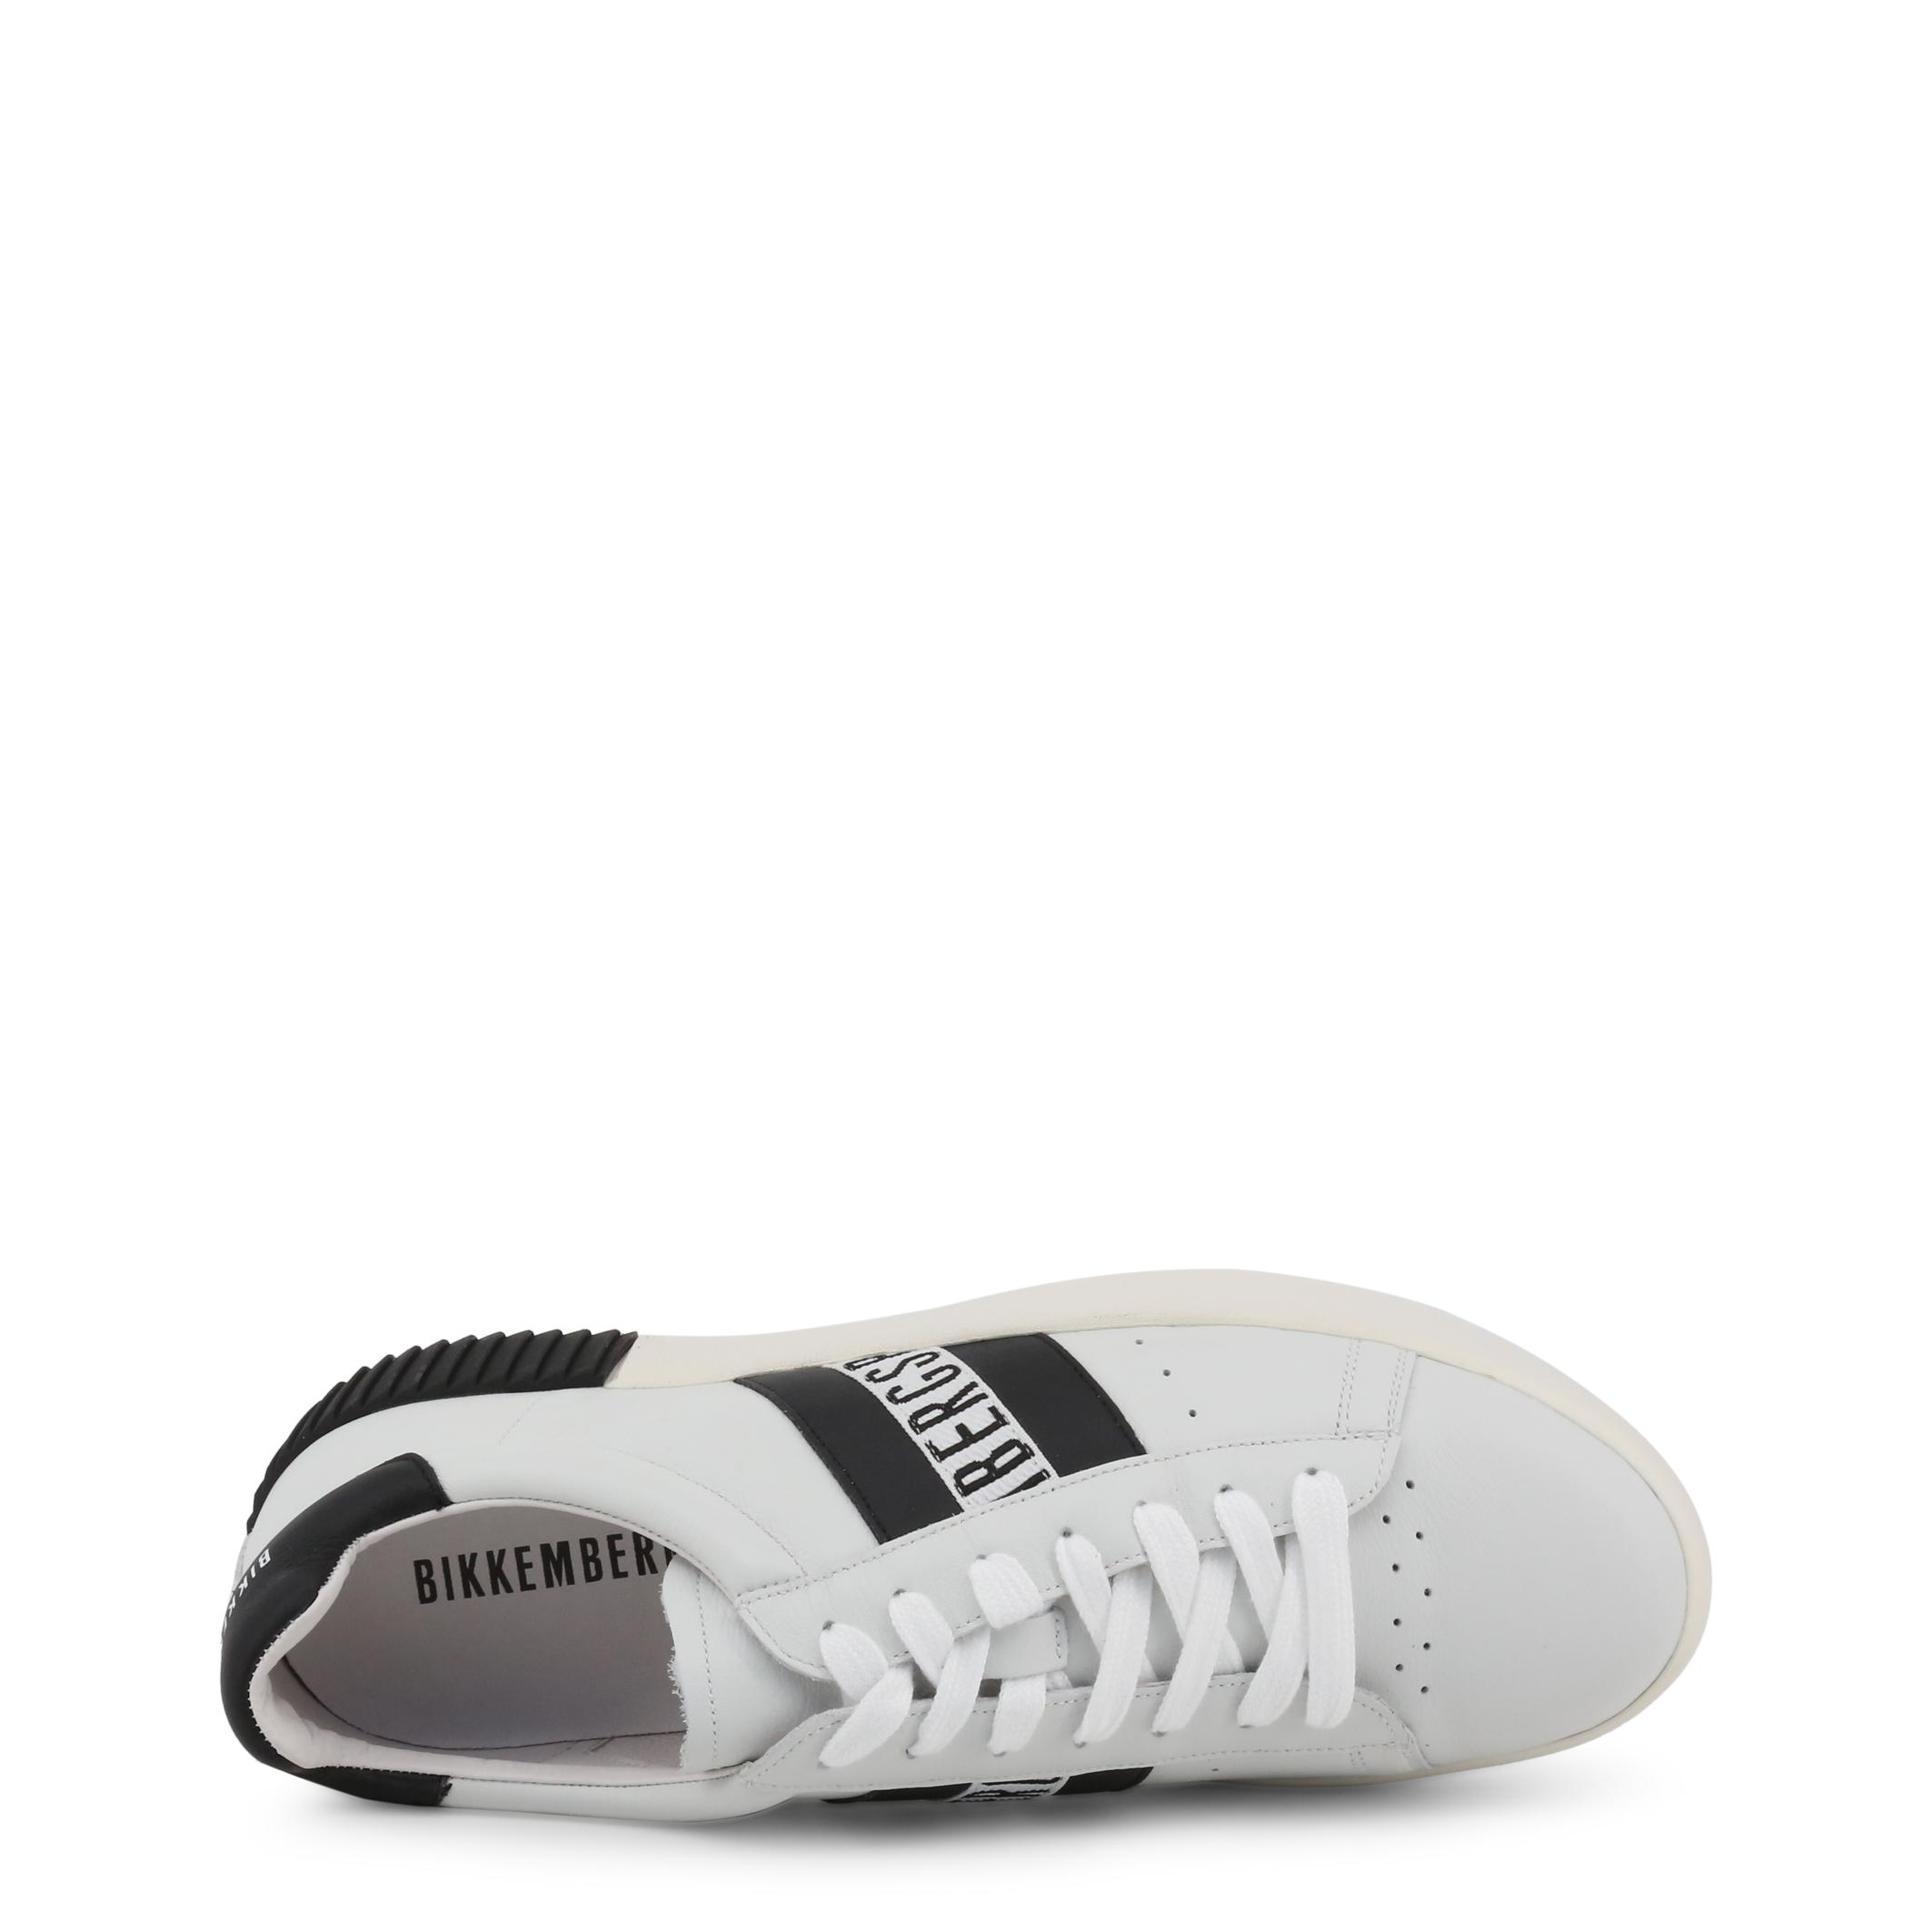 Sneakers-Bikkembergs-COSMOS-2434-Uomo-Bianco-98820 miniatura 3